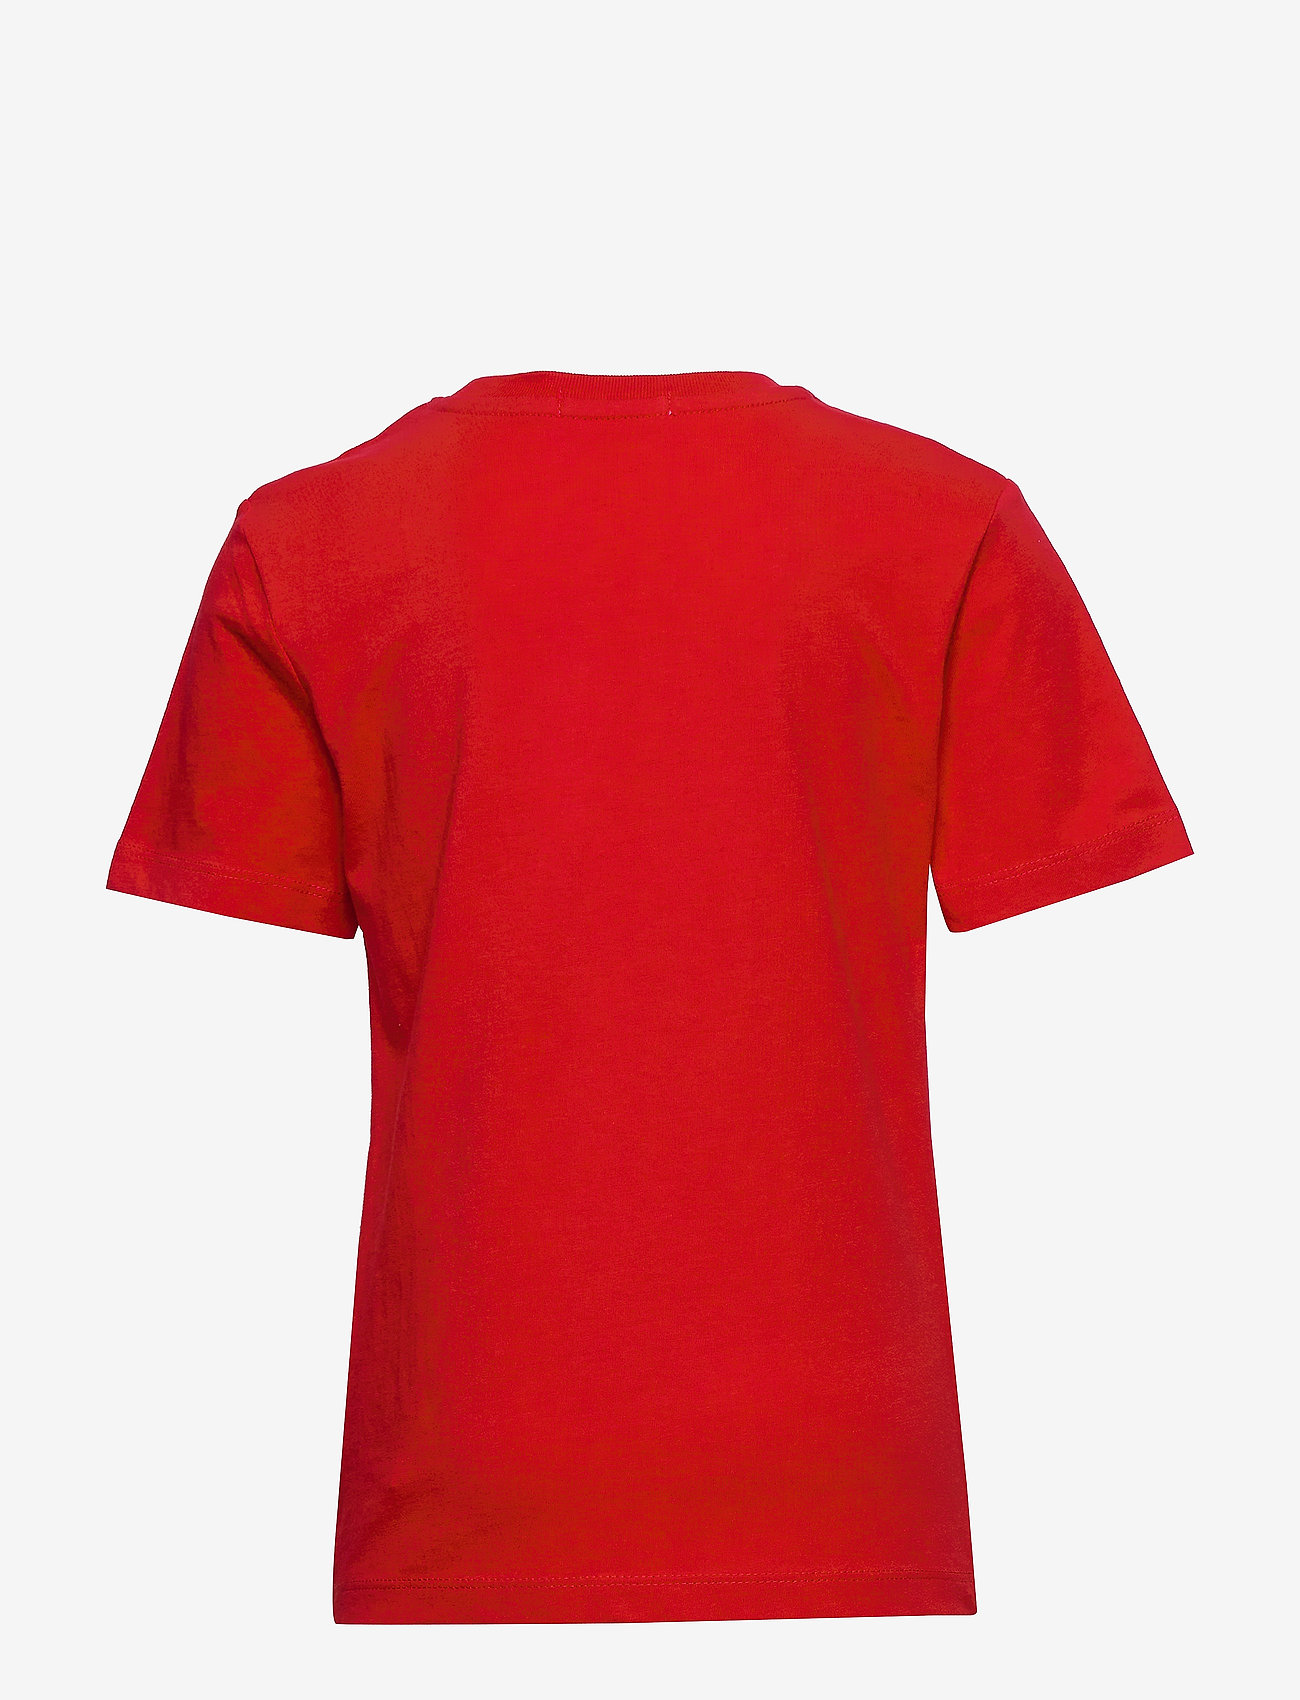 Calvin Klein - MONOGRAM LOGO T-SHIRT - korte mouwen - fierce red - 1